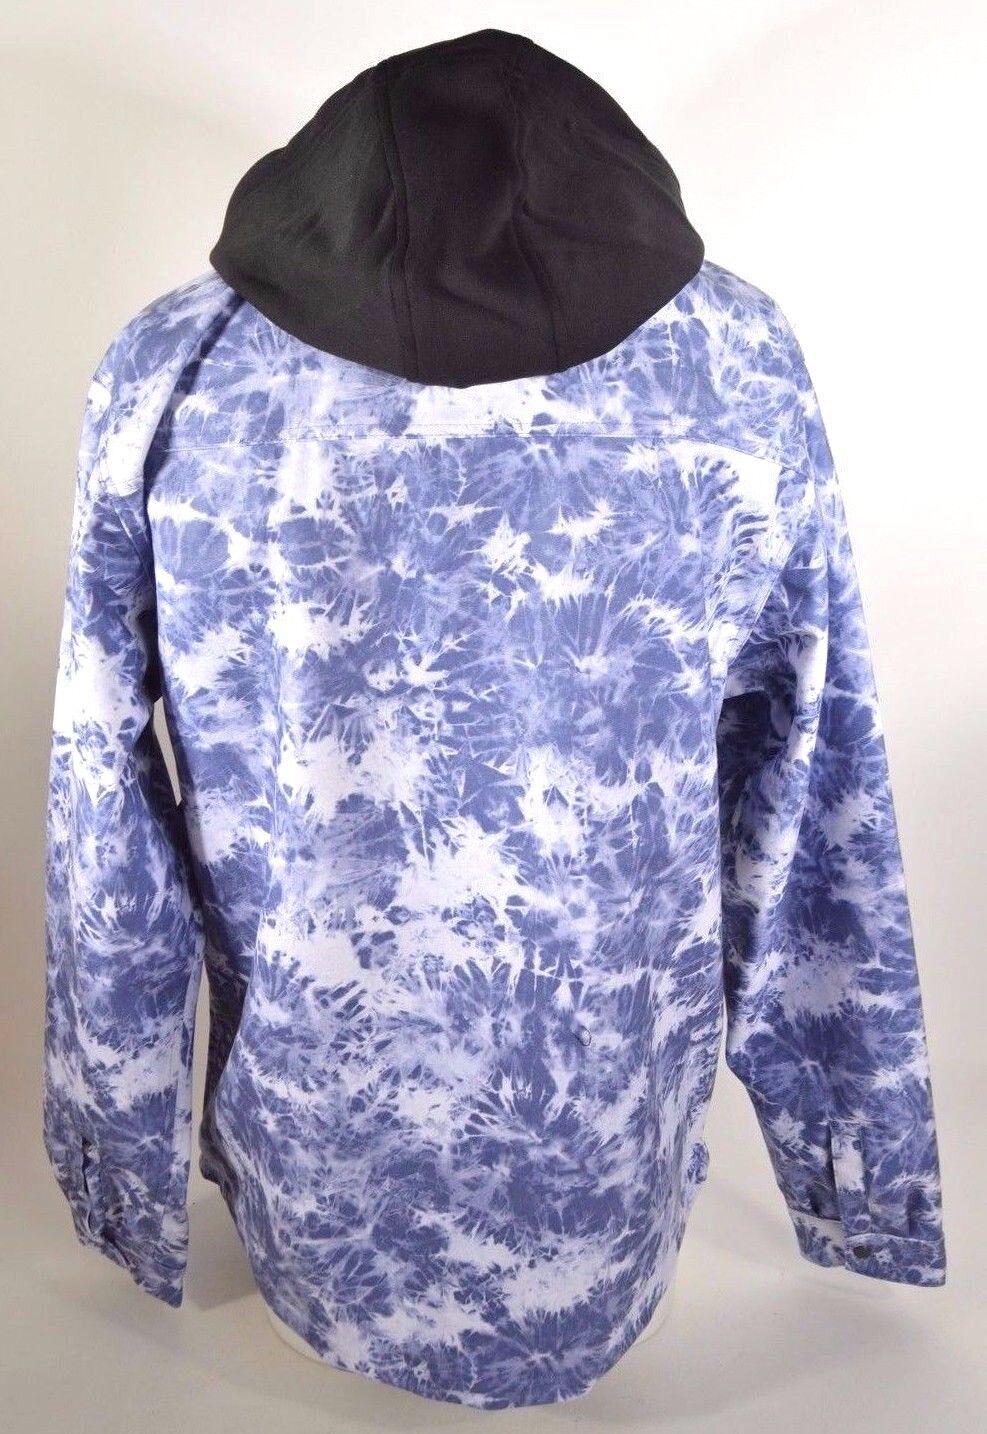 2015 NWT MENS 686 TECH GOODS ALOHA BONDED JACKET $90 XL blue tie dye snap front